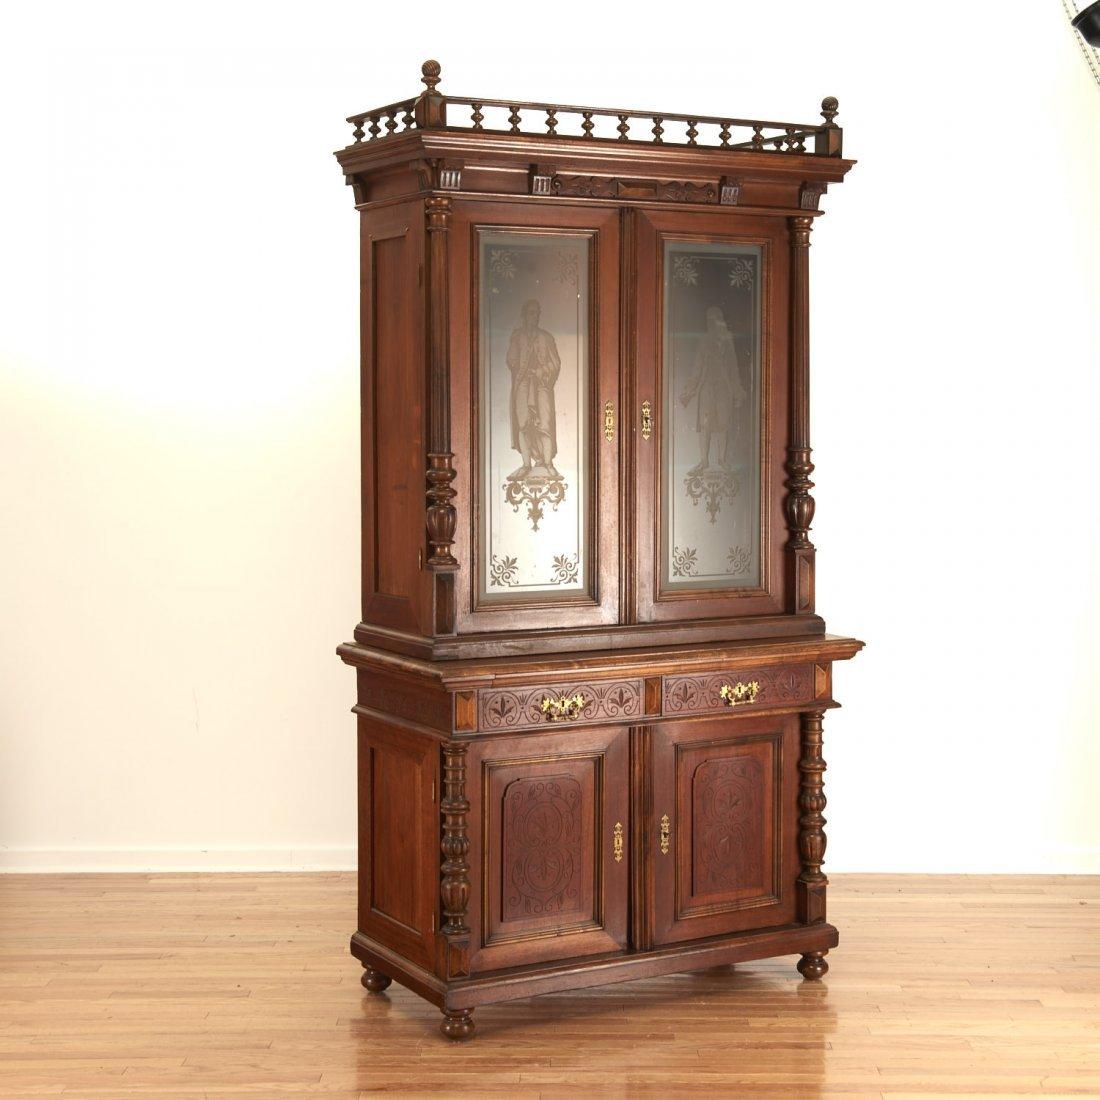 German Jacobean style mahogany bookcase cabinet - 2